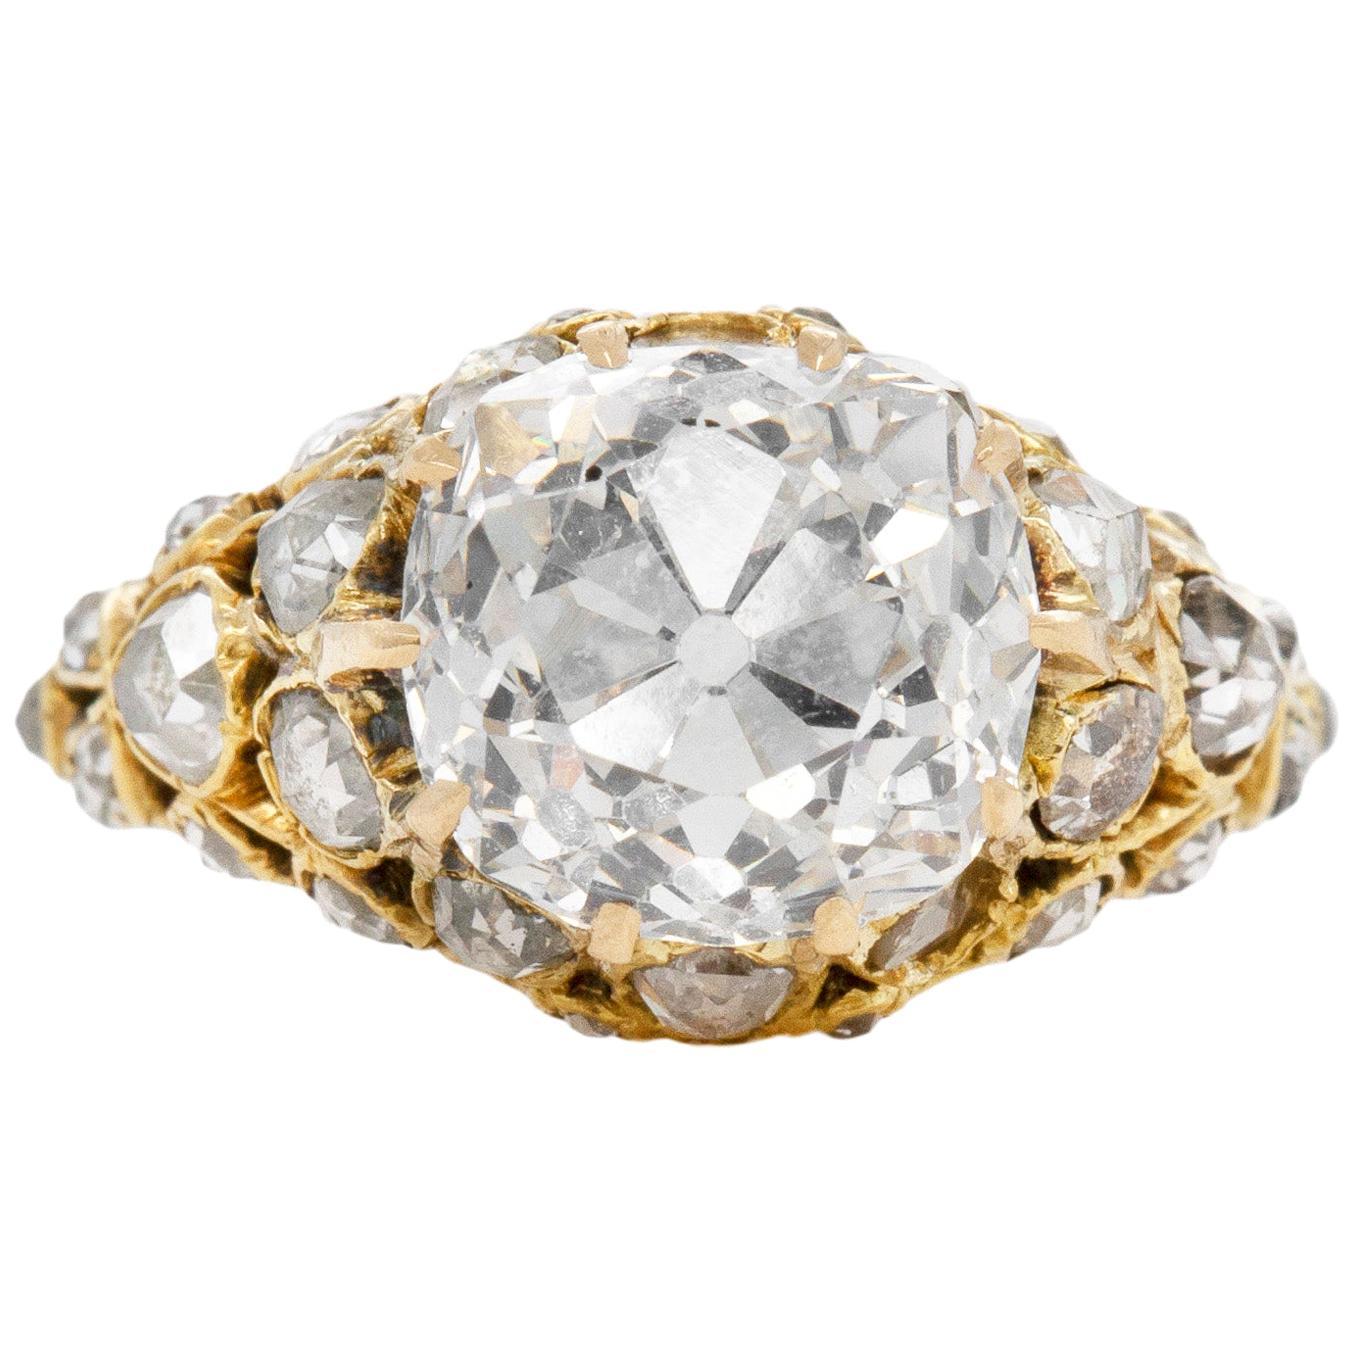 Victorian 3.20 Carat GIA Old European Cut Diamond Engagement Ring